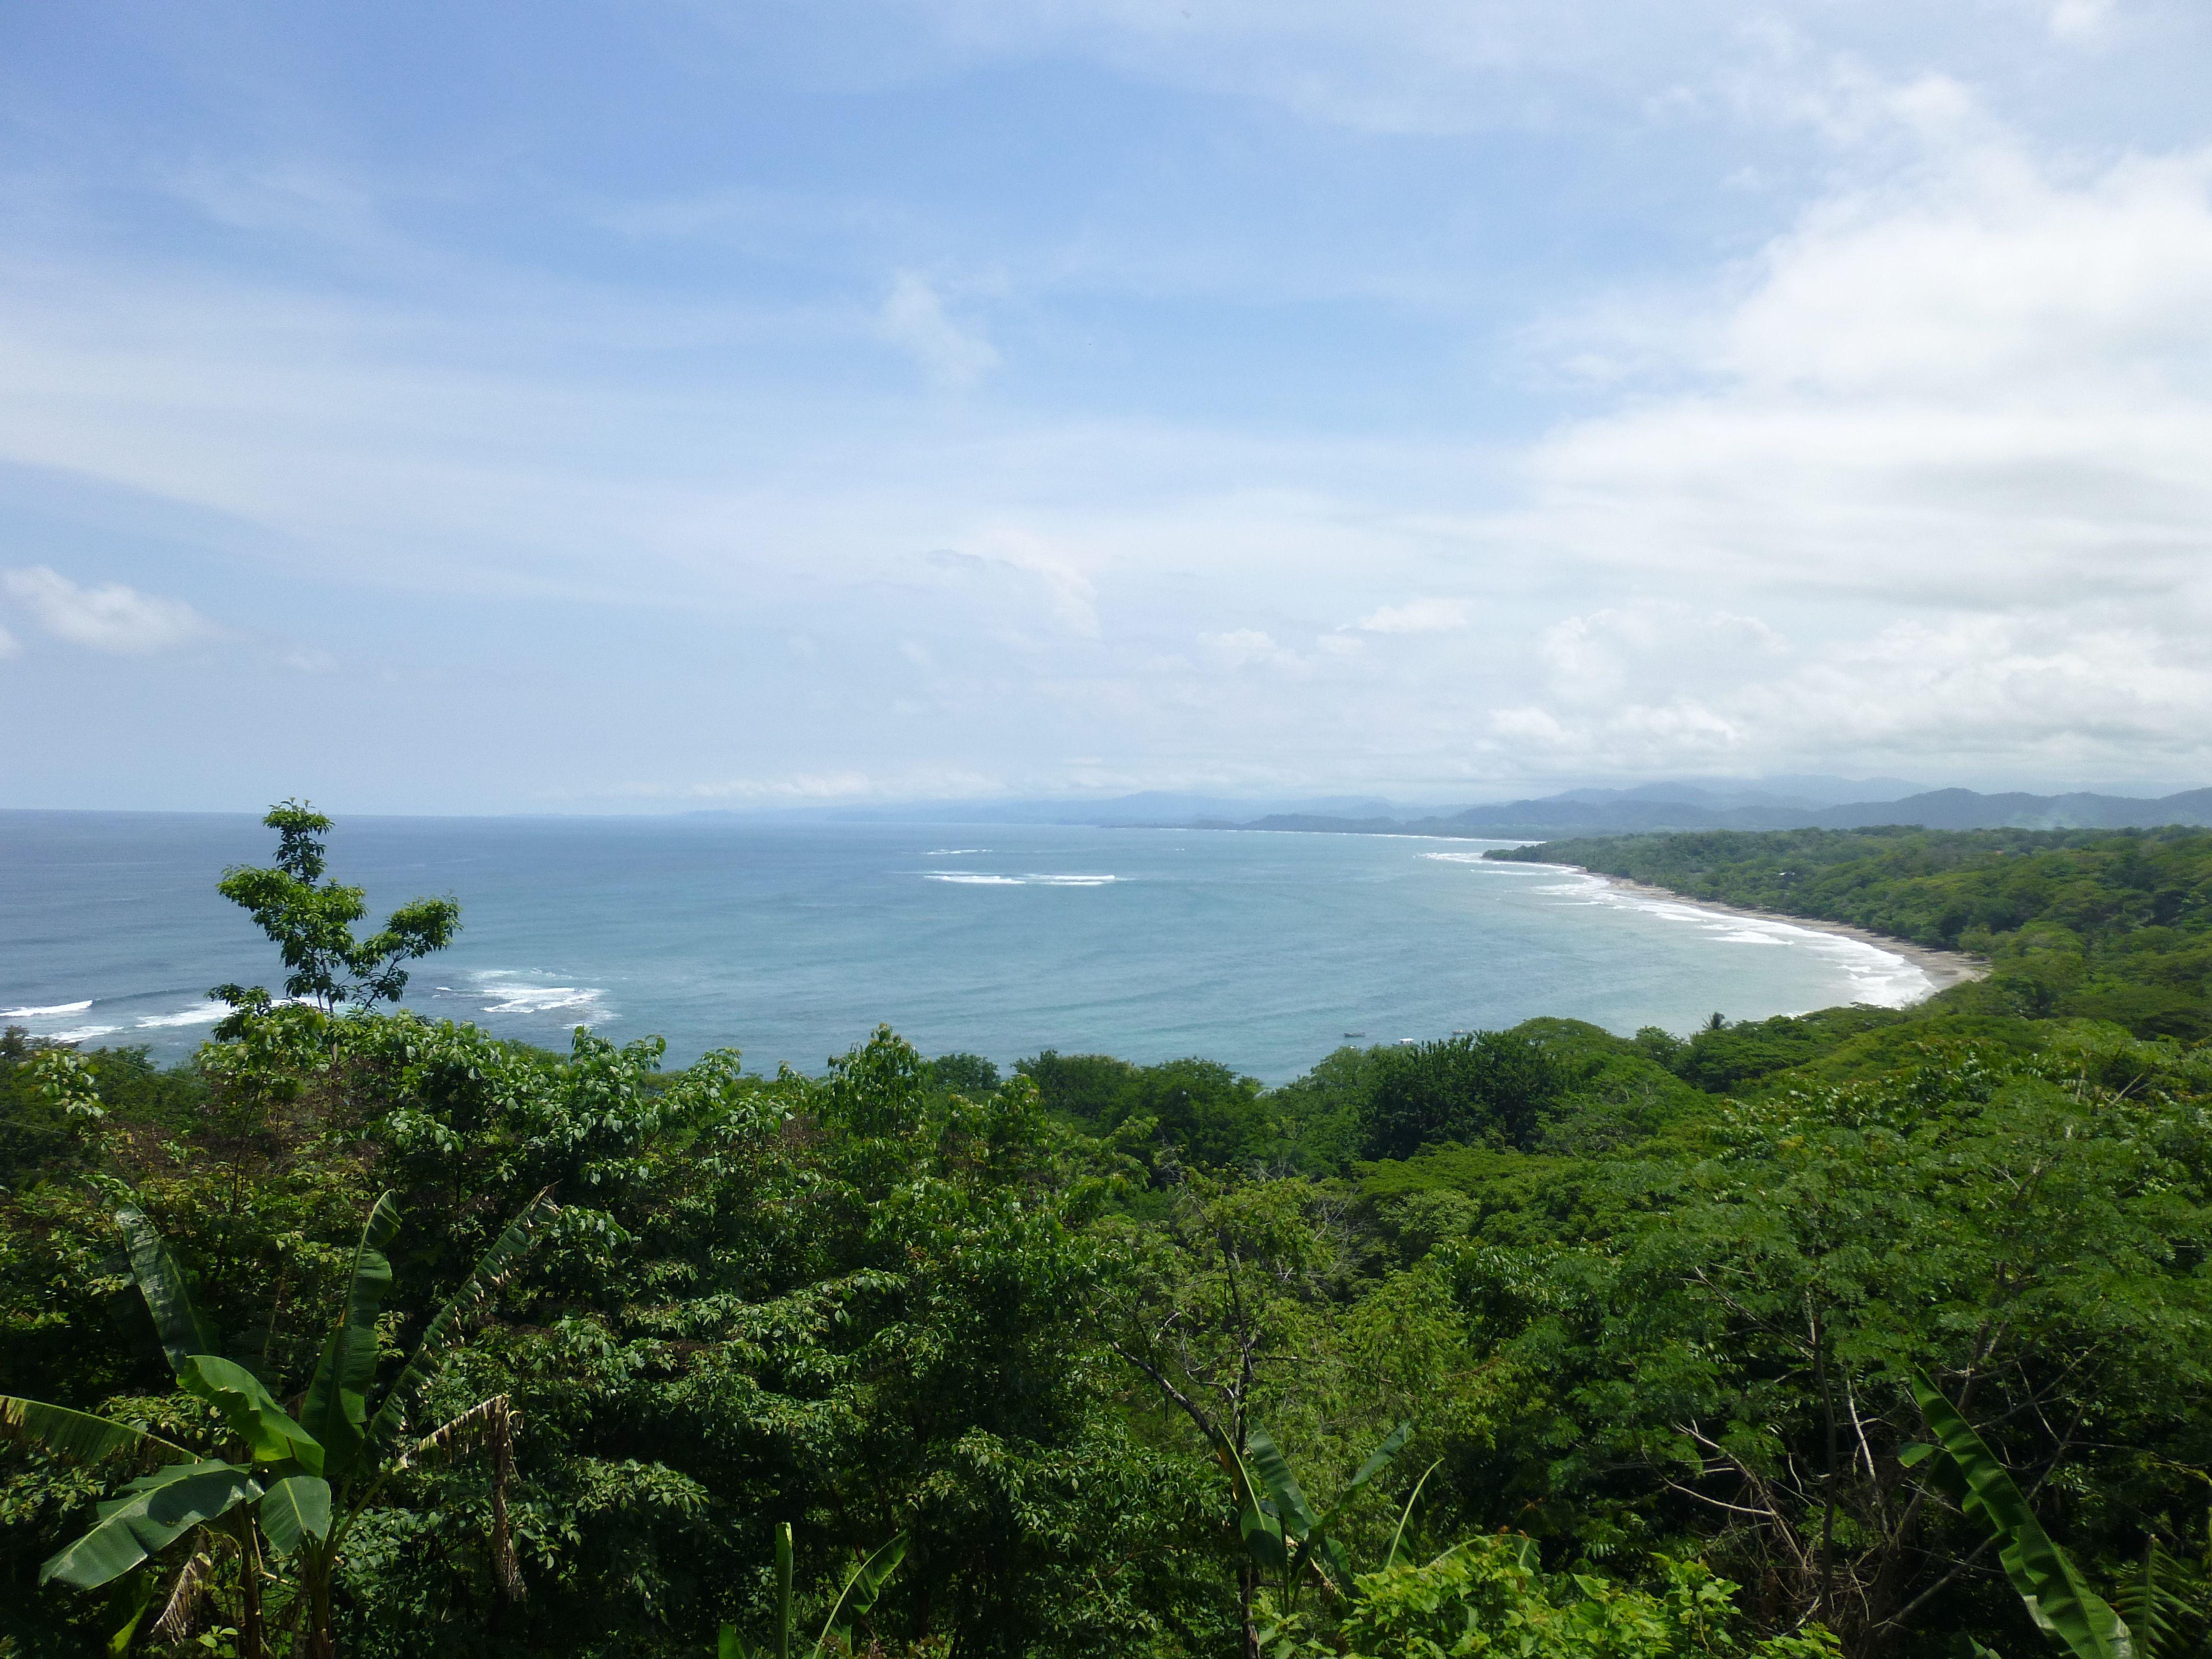 http://ackermanrealtyinternational.com/property/manzanilla-lot-2/ ... #CostaRica #Manzanillo #costaricarealestate - Costa Rica Real Estate #buycostaricarealestate - Buy Costa Rica Real Estate